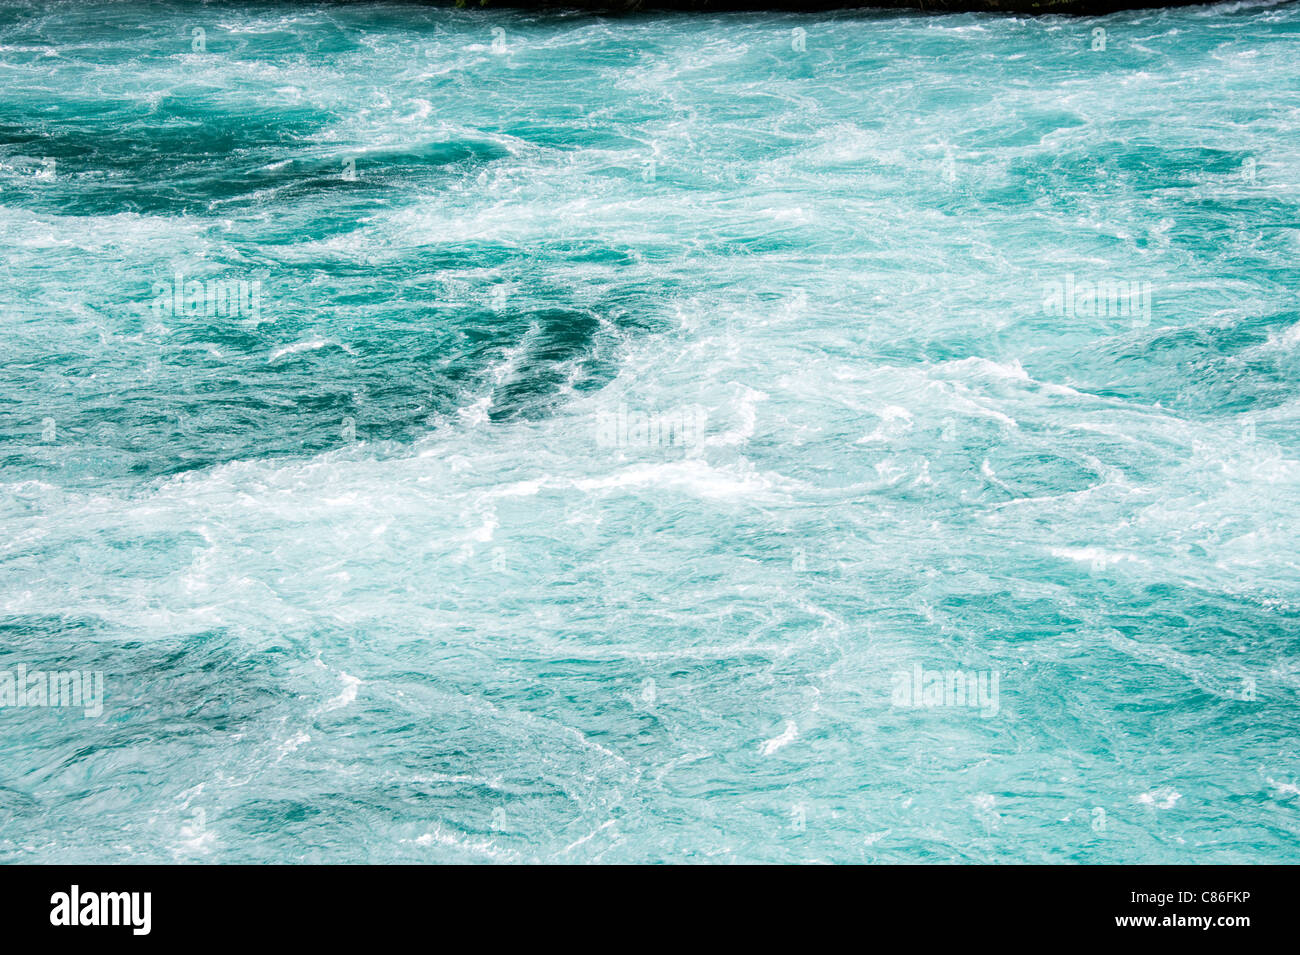 The Fast Flowing Waikato River at Huka Falls near Taupo North Island New Zealand - Stock Image